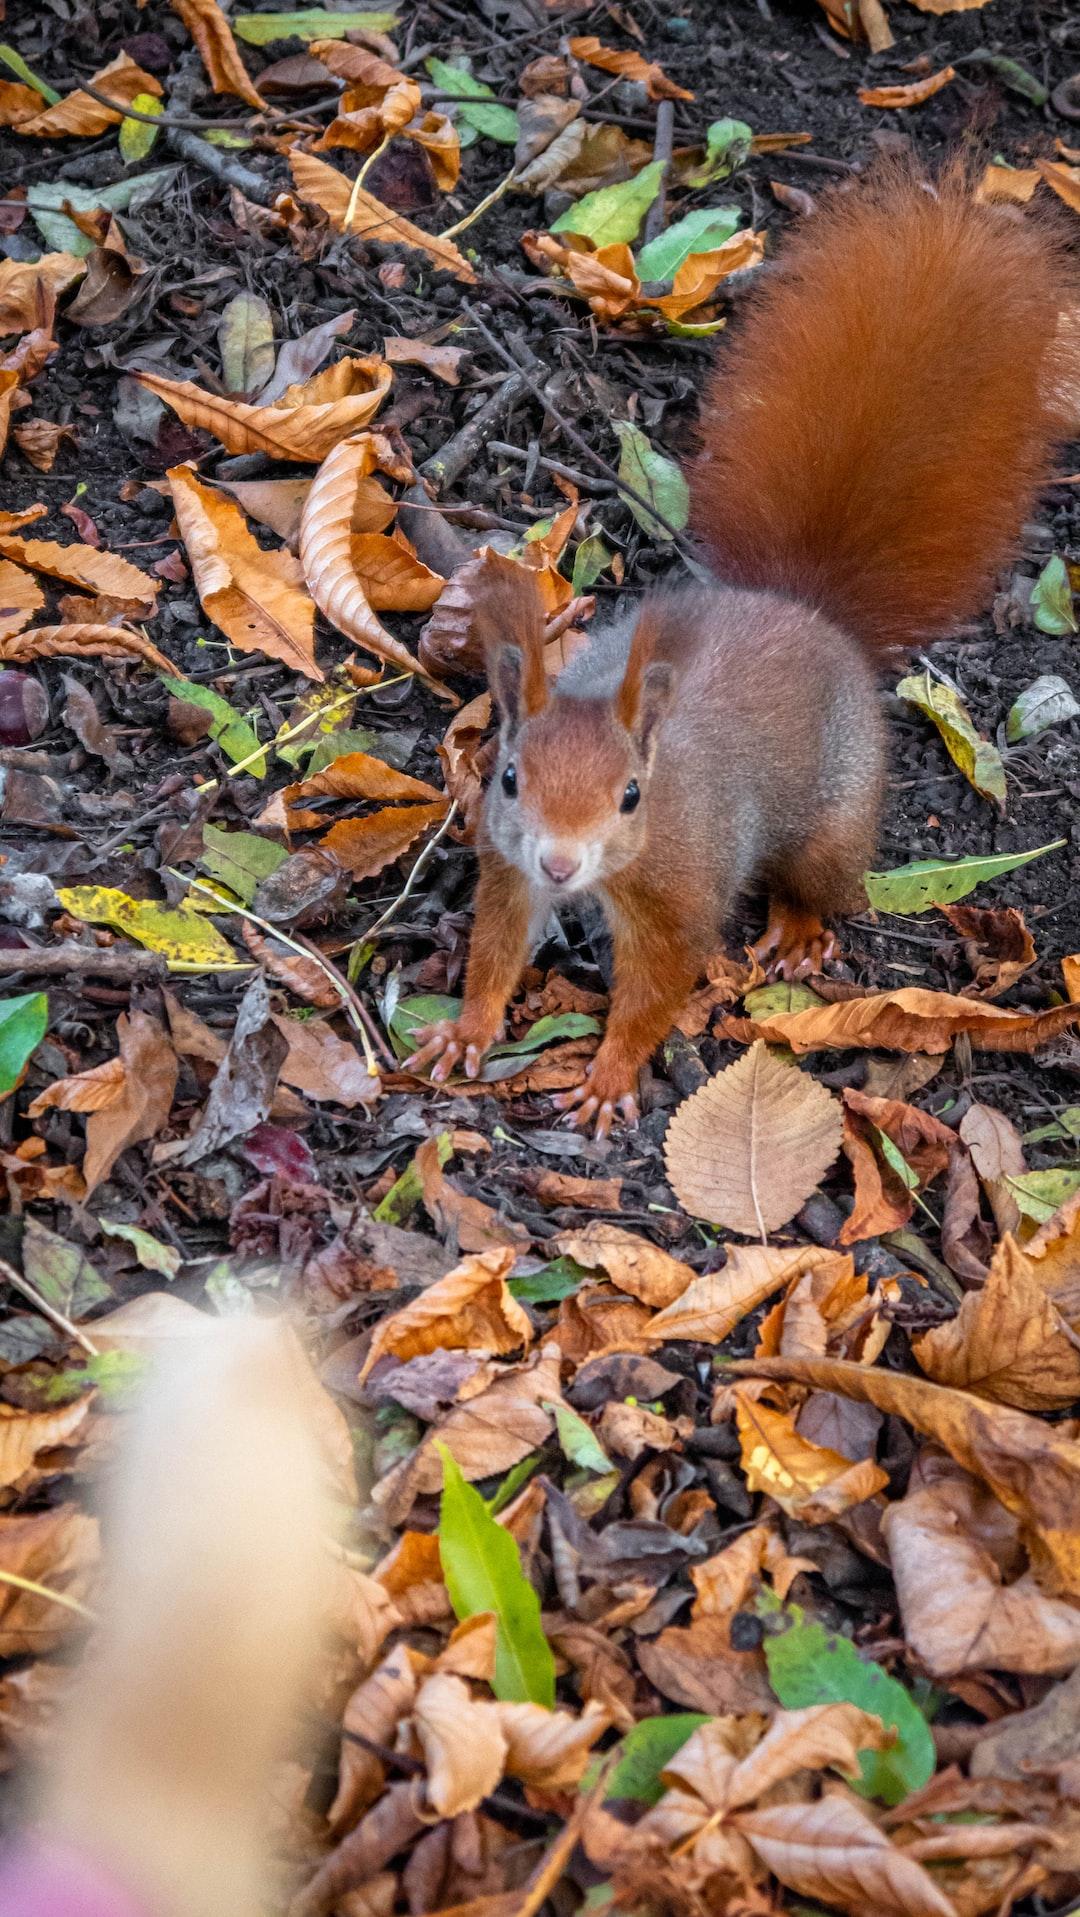 A Orange Squirrel Looking At The Peanut!